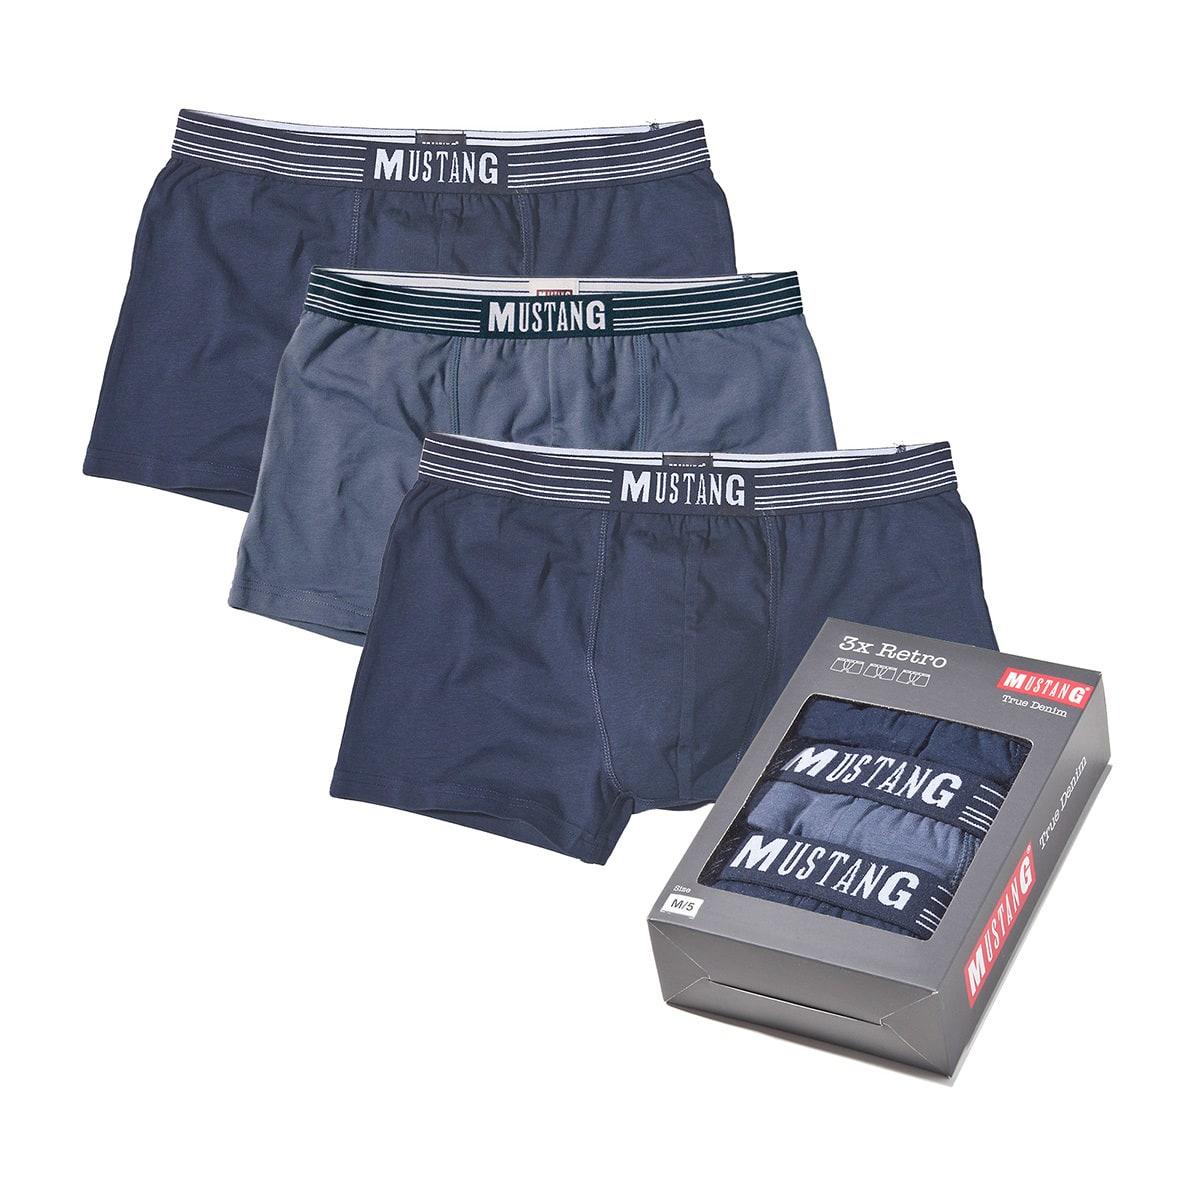 Mustang Herren 3er Pack Boxershorts Retro navy